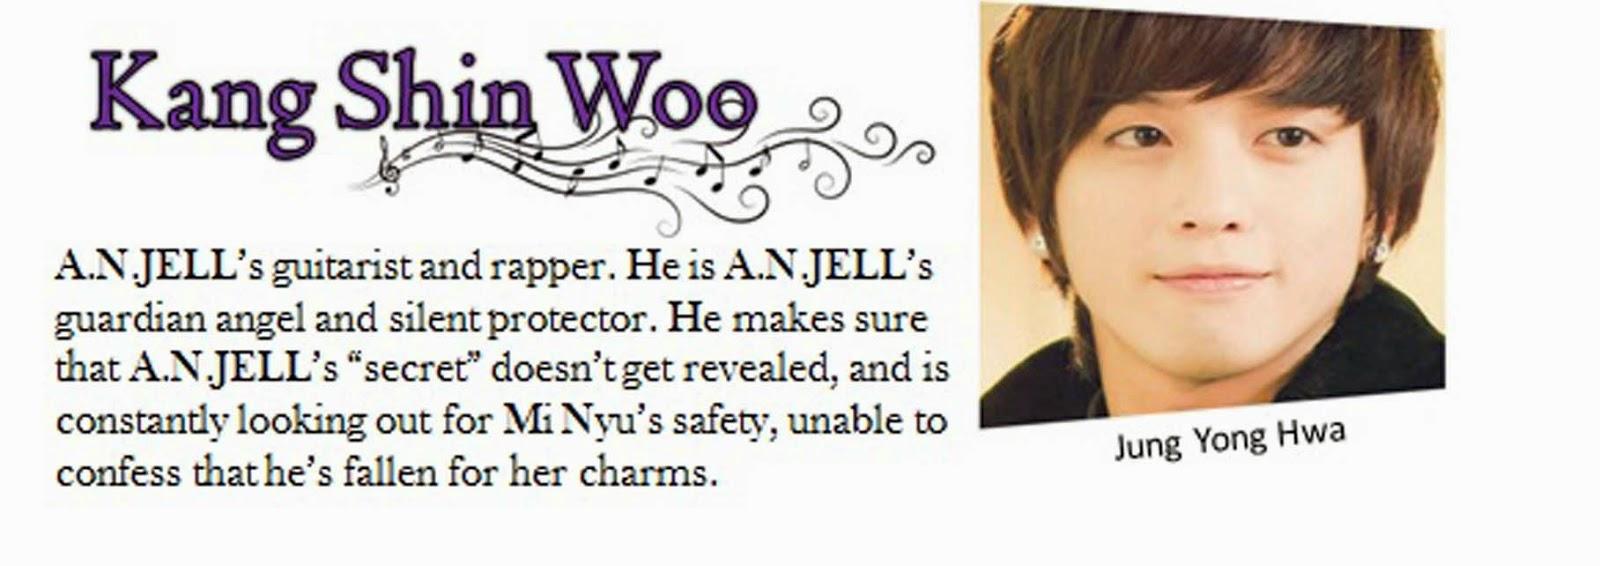 Jung yong hwa sebagai Kang shin woo